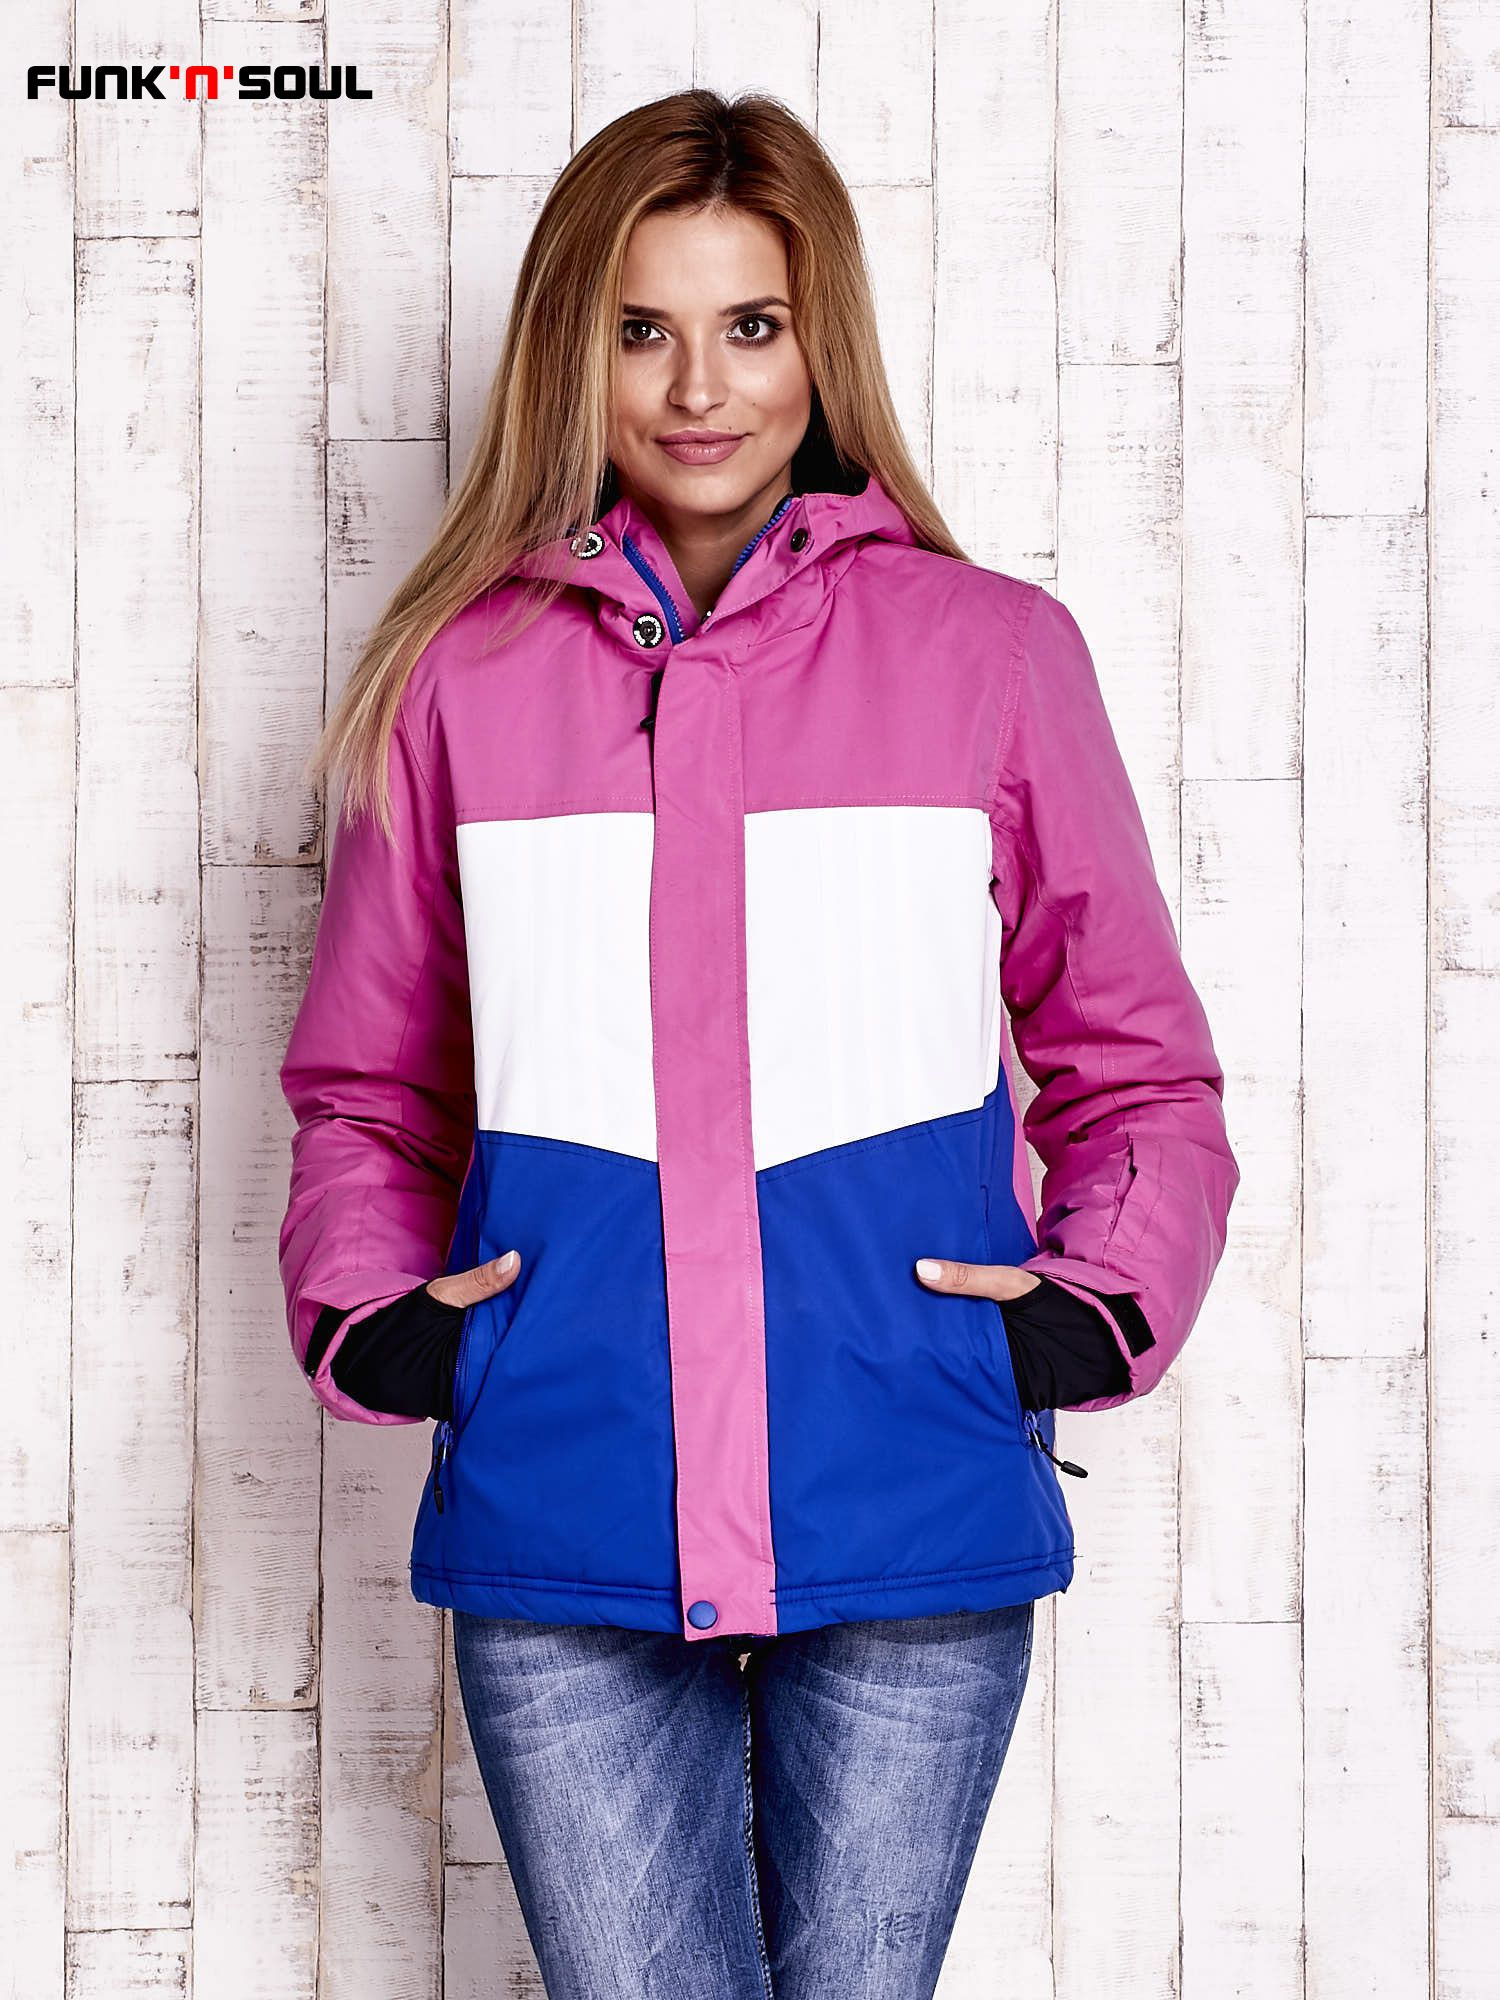 Rozowa Modulowa Kurtka Narciarska Z Kapturem Funk N Soul Zdj Sport Outfits Clothes Rain Jacket